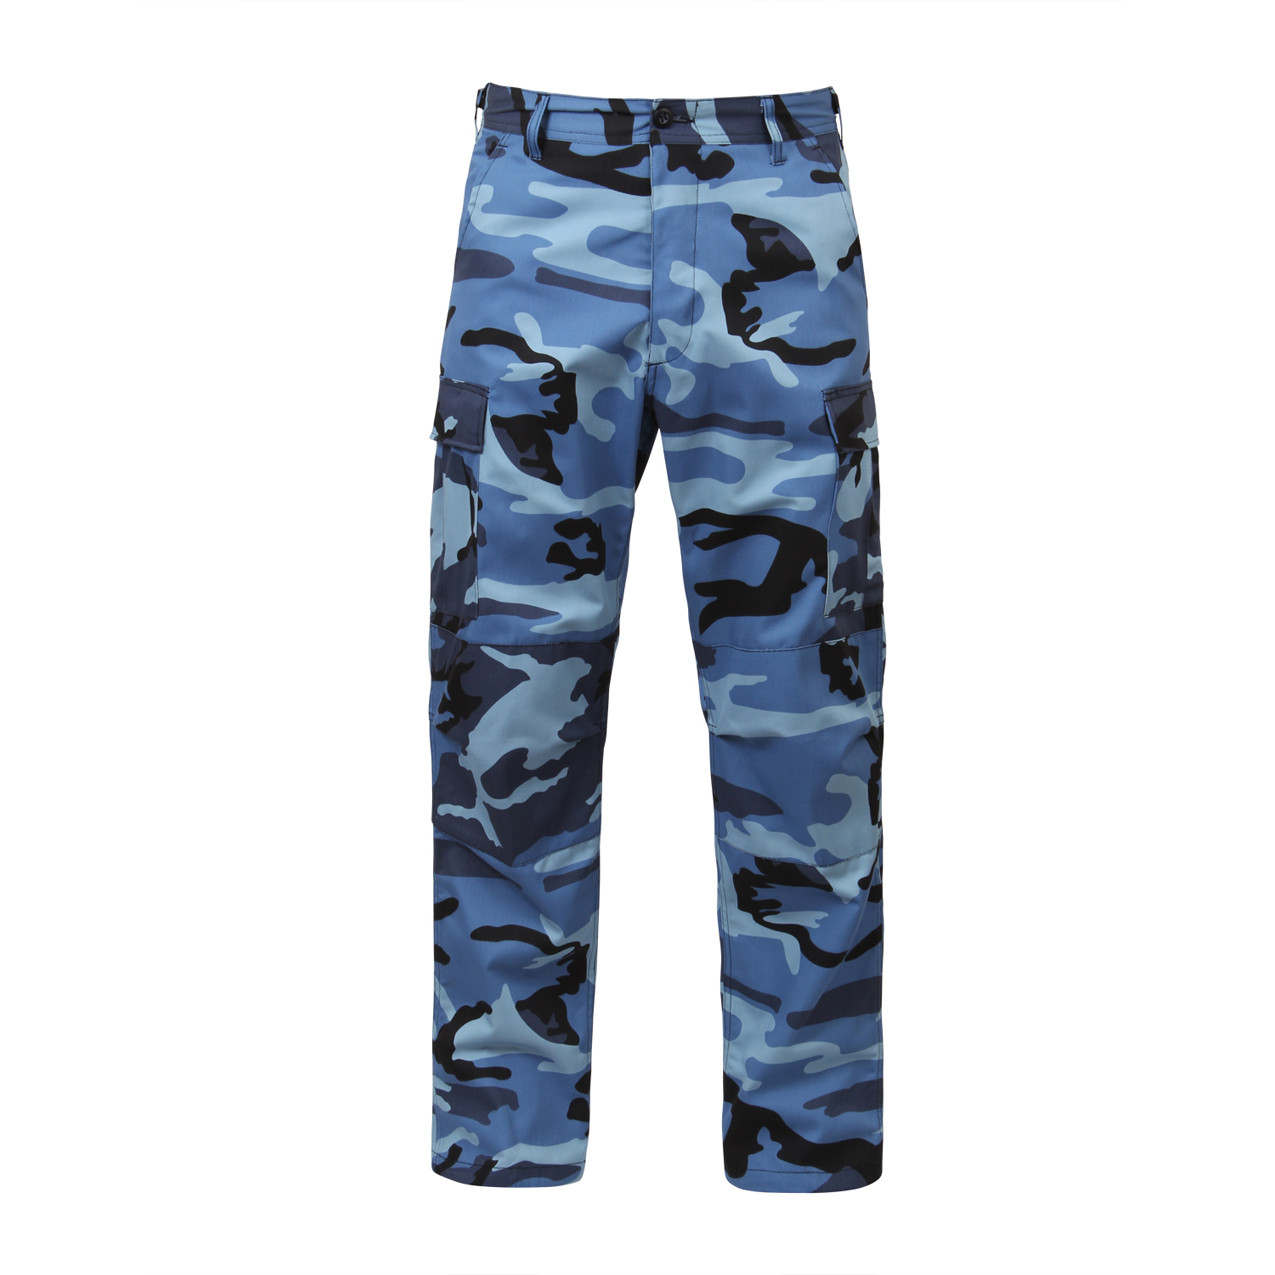 Shop Sky Blue Camo BDU Pants - Fatigues Army Navy Gear 591a18377aa